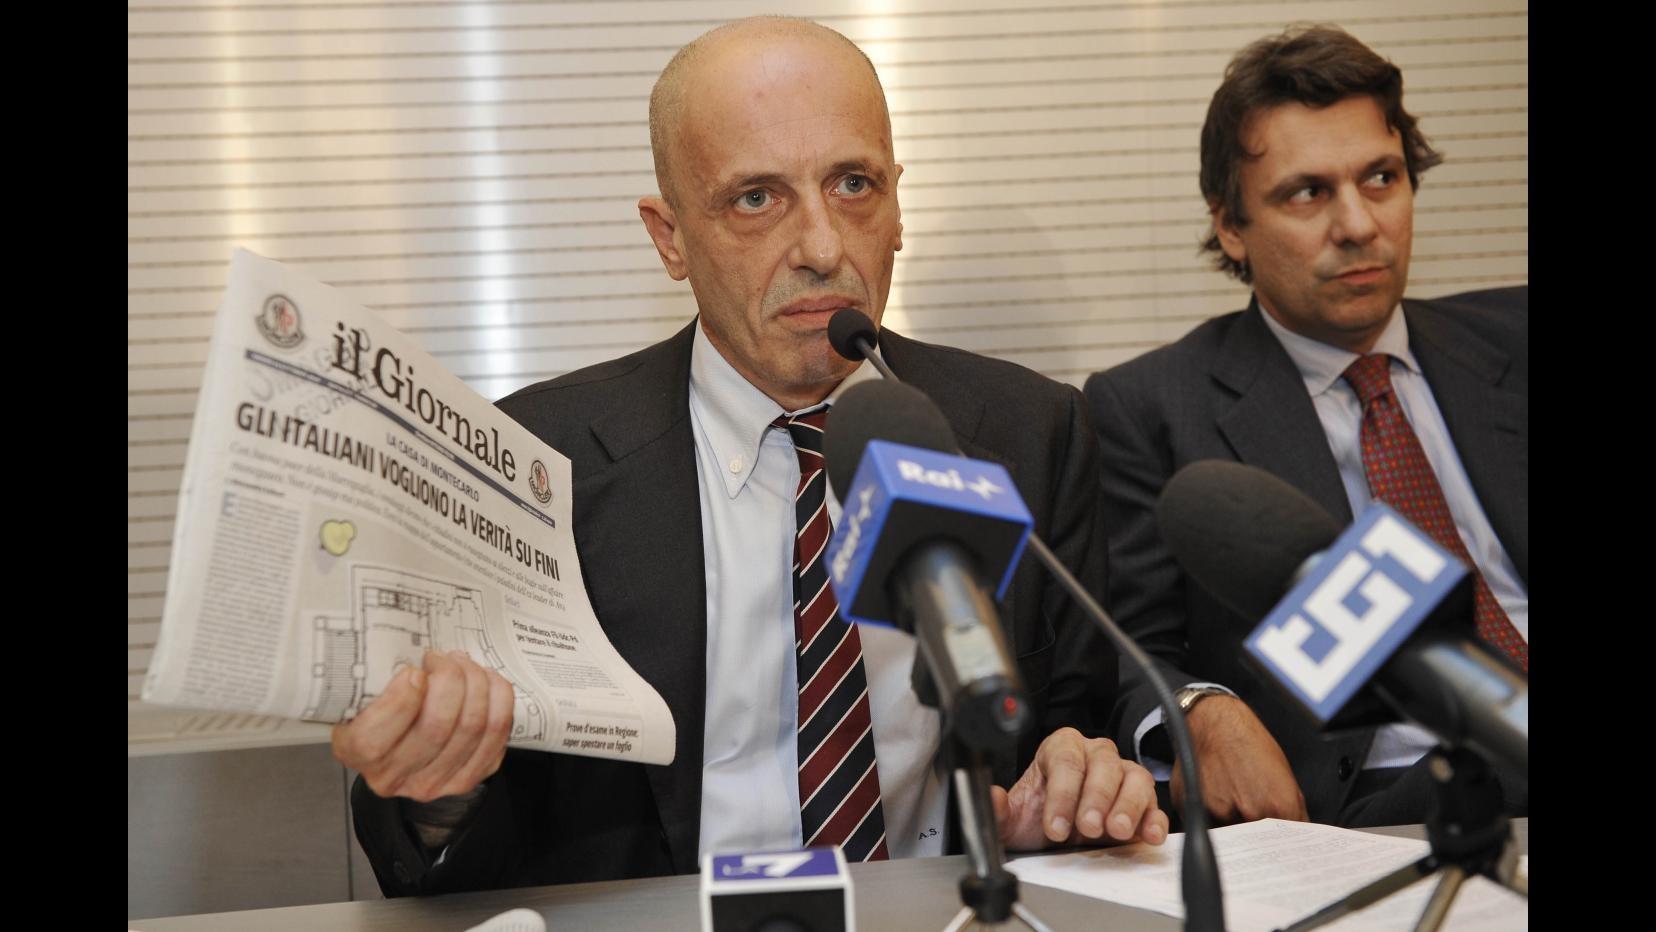 Nuova udienza per Sallusti in tribunale a Milano